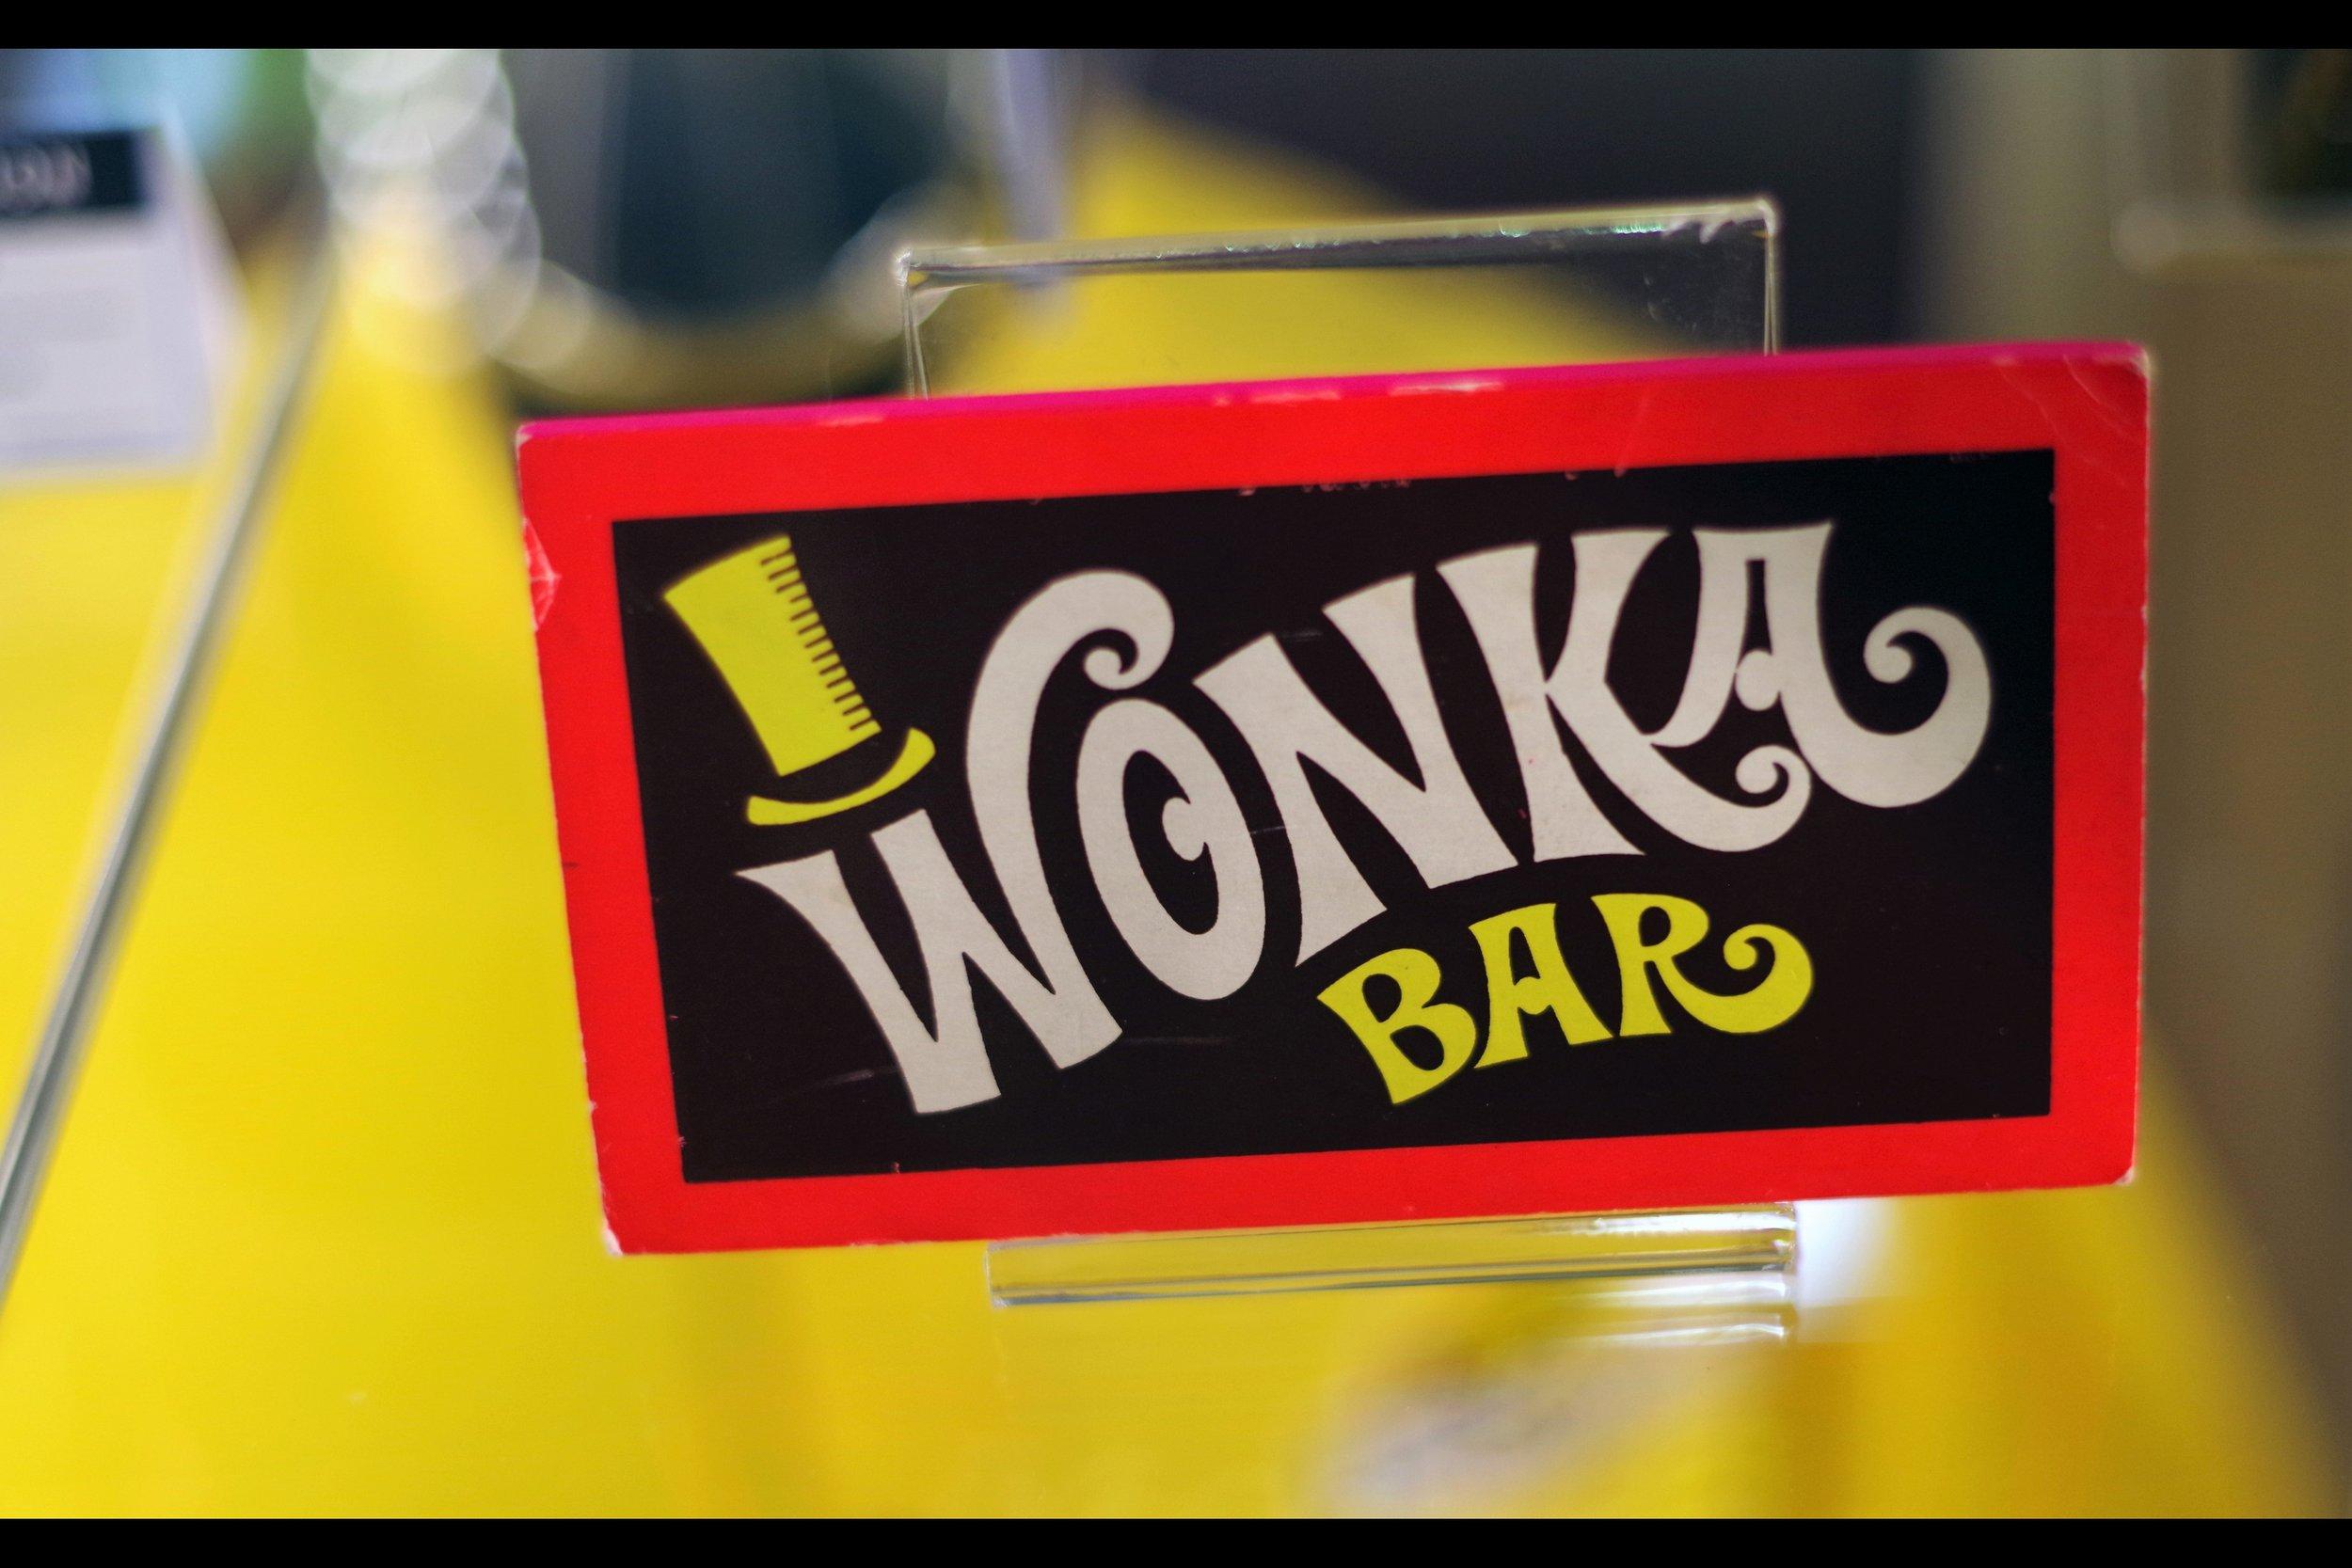 Wonka Bar. Starting bid: £5,000.  Inedible. W inning bid £8,000